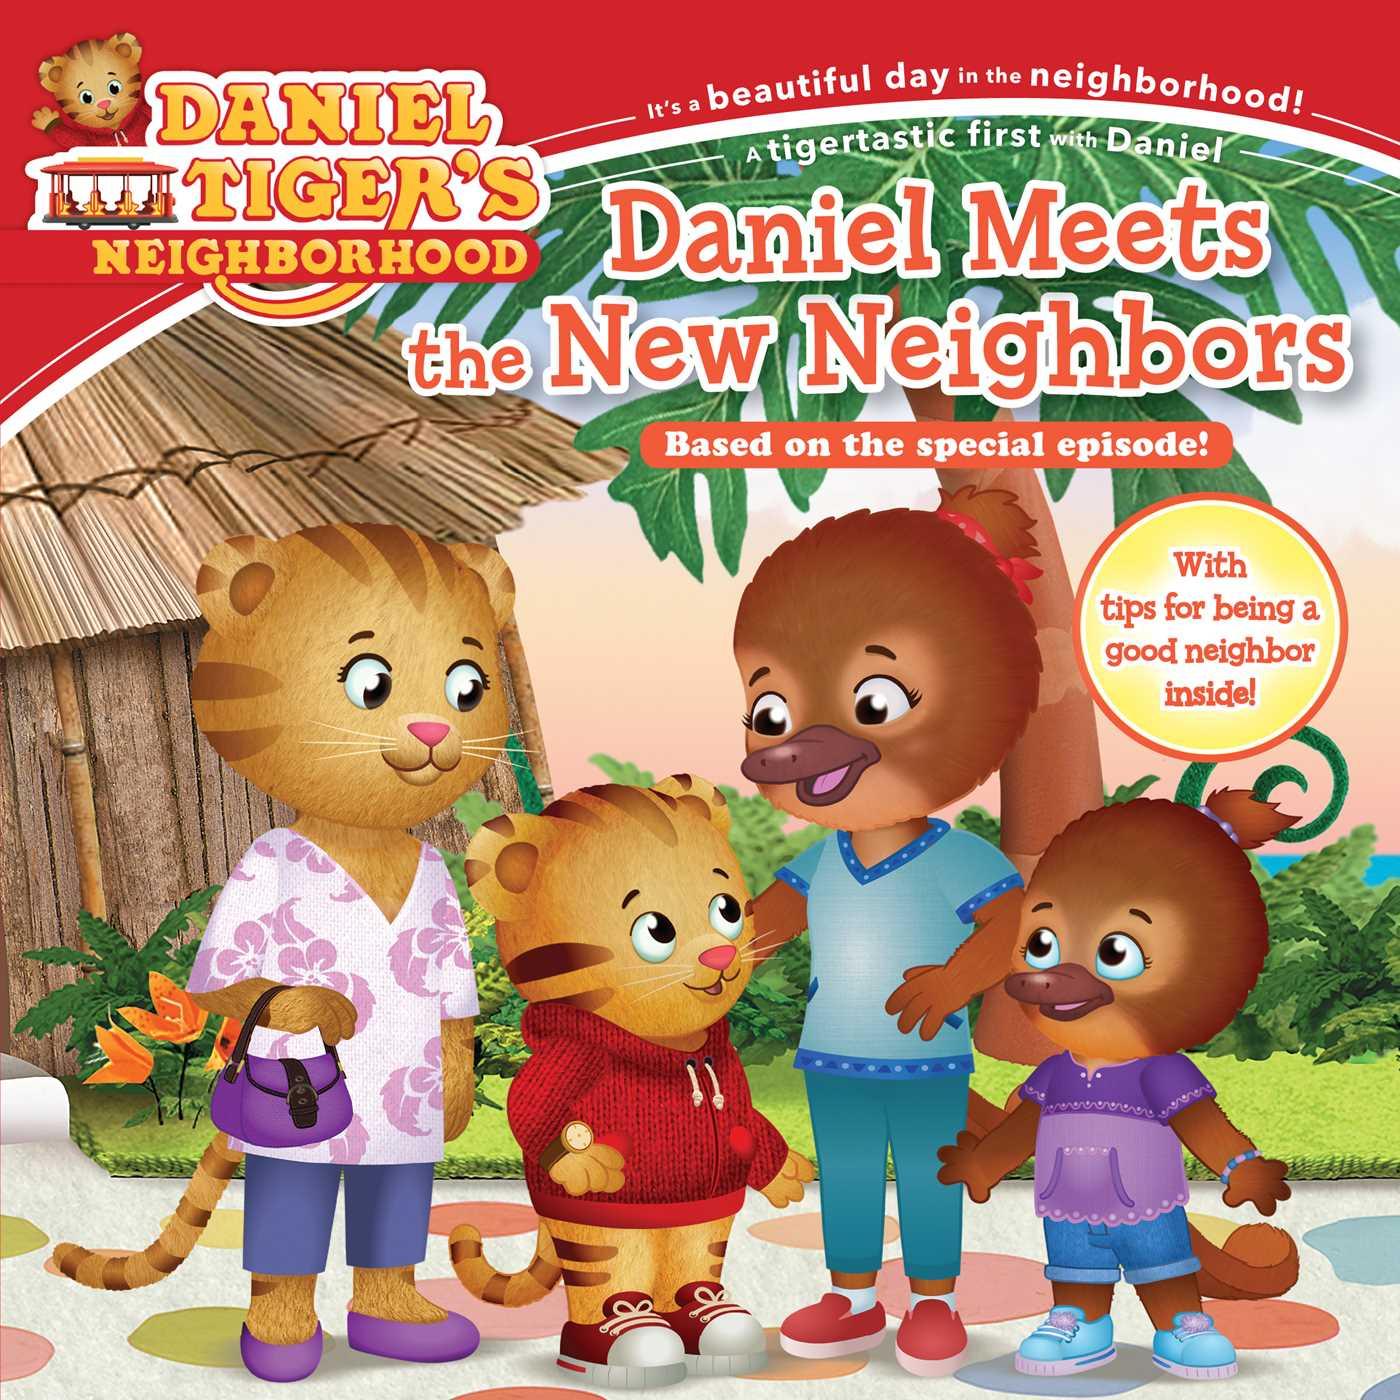 Daniel meets the new neighbors 9781534429628 hr